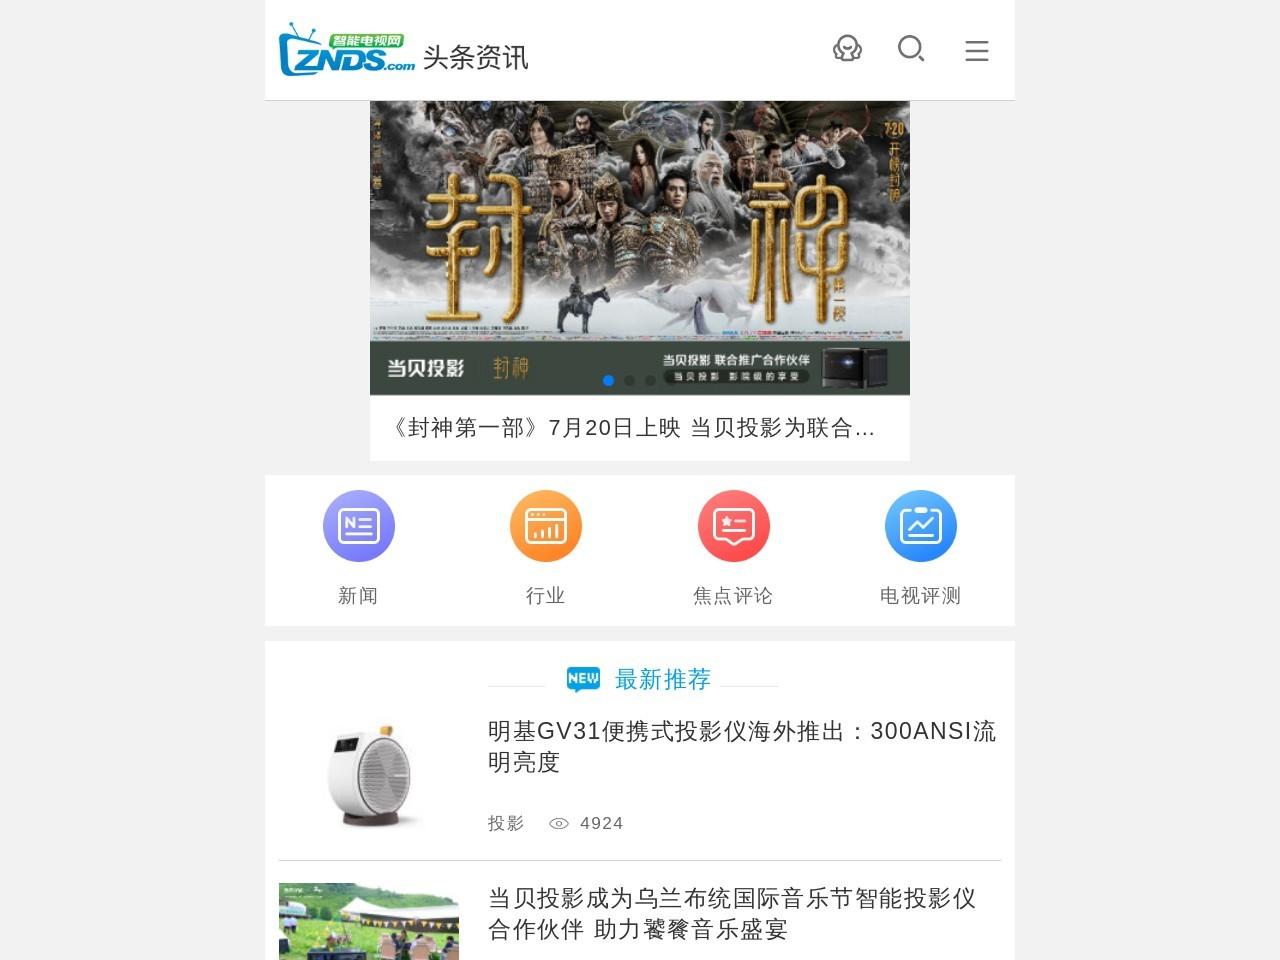 ZNDS资讯_智能电视之家_OTT电视盒子行业垂直媒体